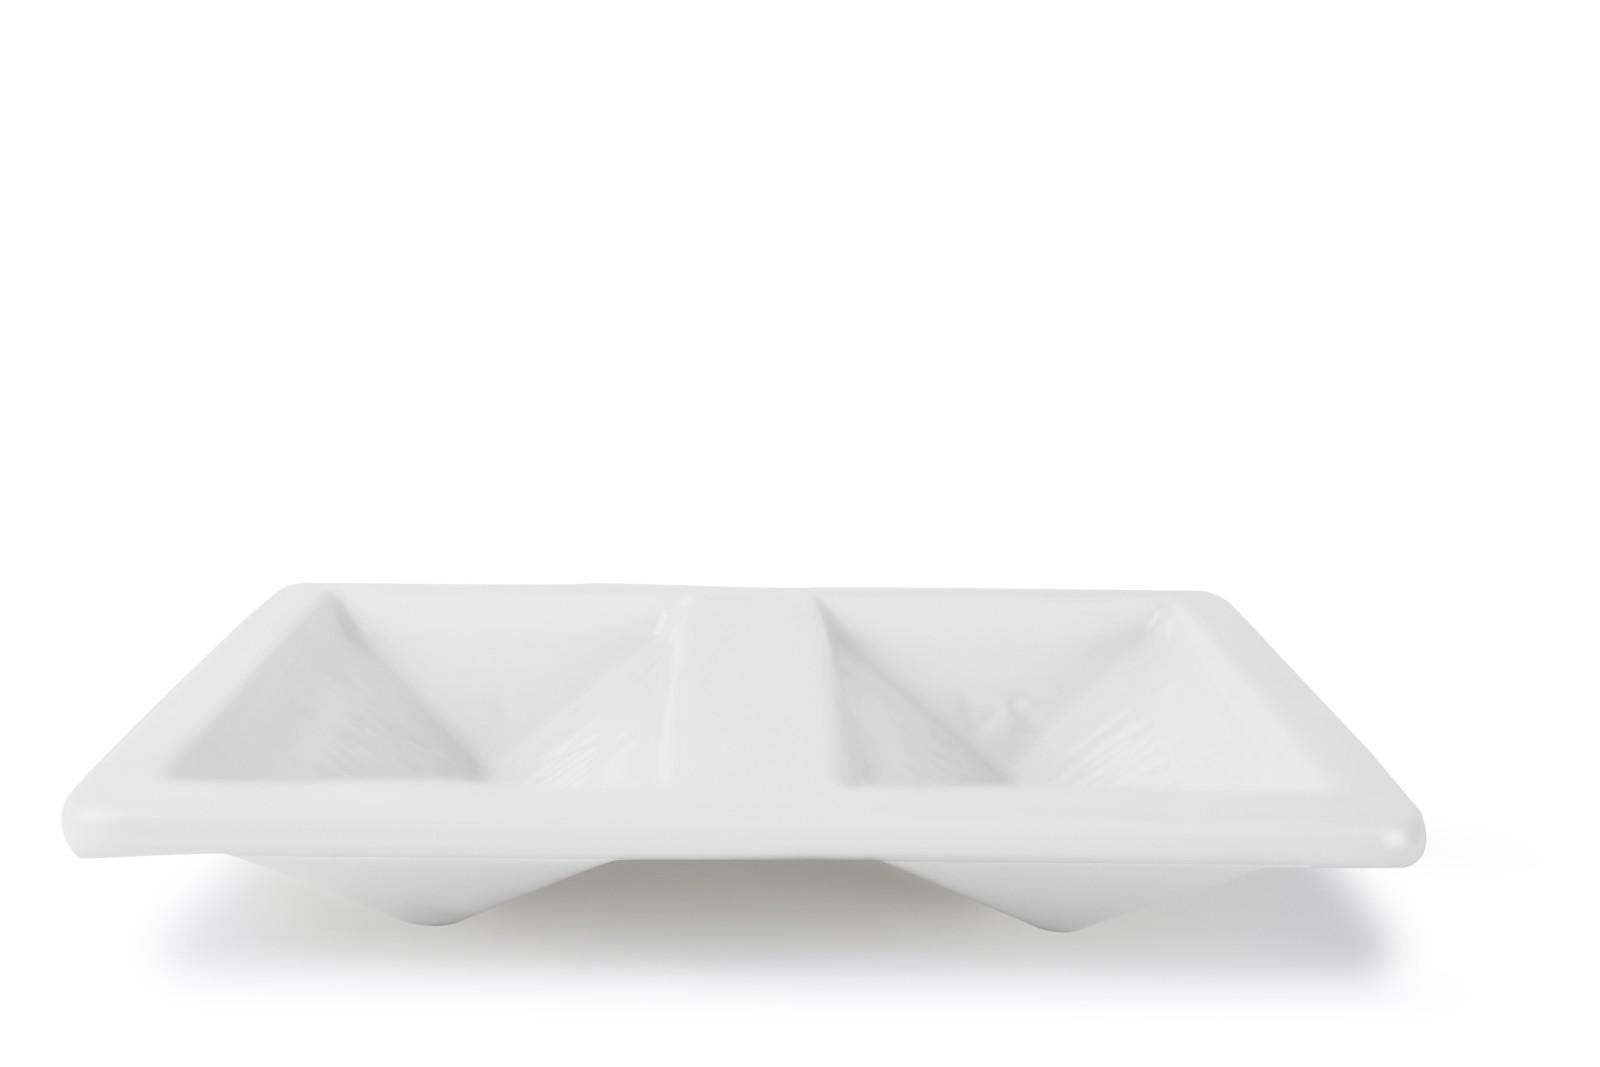 Brick Dish Plate